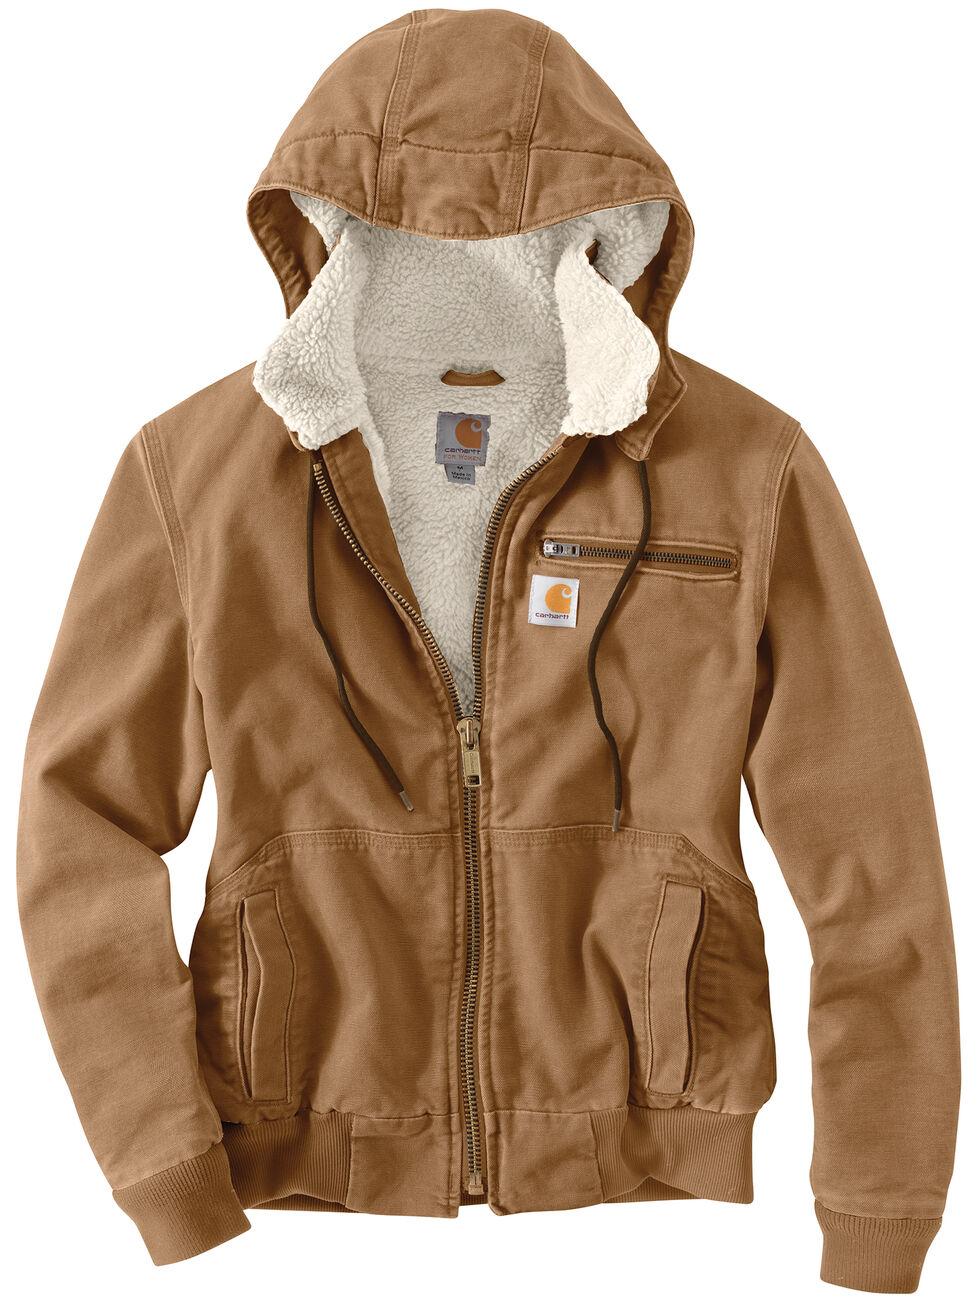 Carhartt Weathered Duck Wildwood Jacket, Brown, hi-res